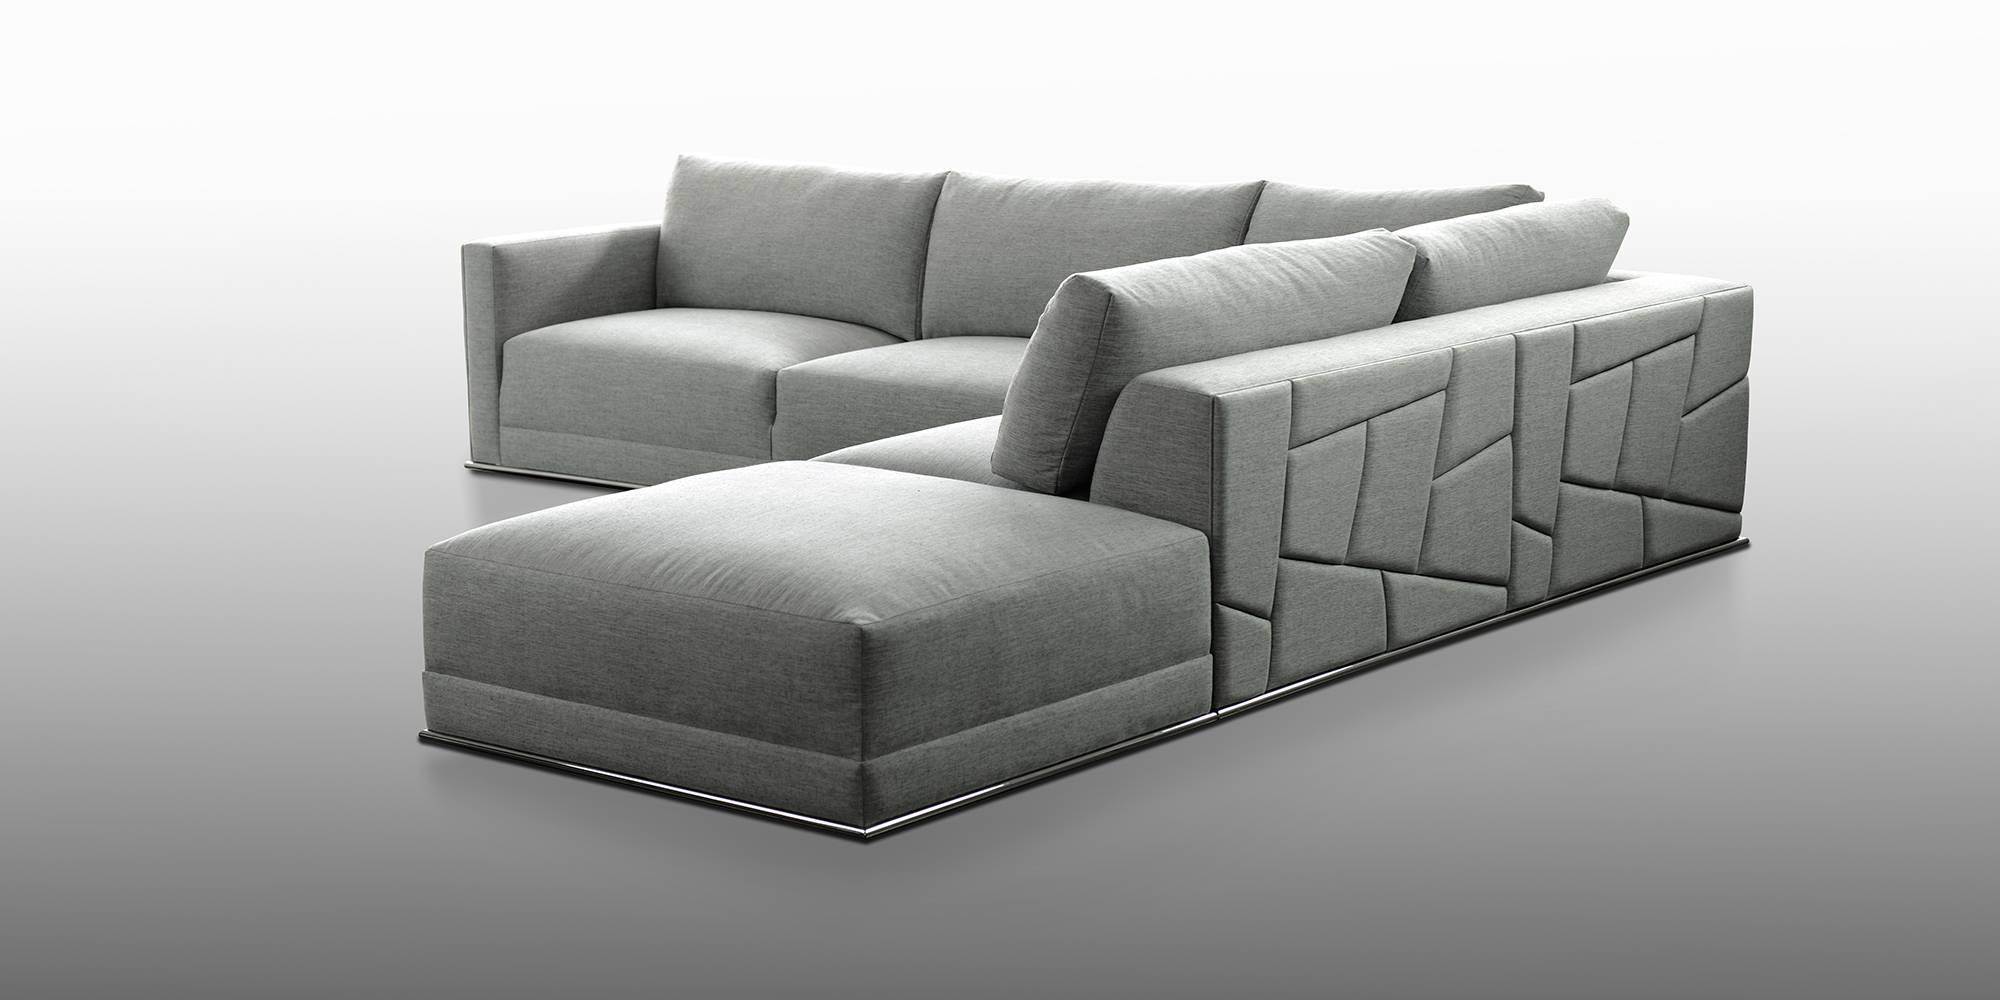 Elan Sectional - Nathan Anthony Furniture inside Nathan Anthony Sofas (Image 5 of 15)